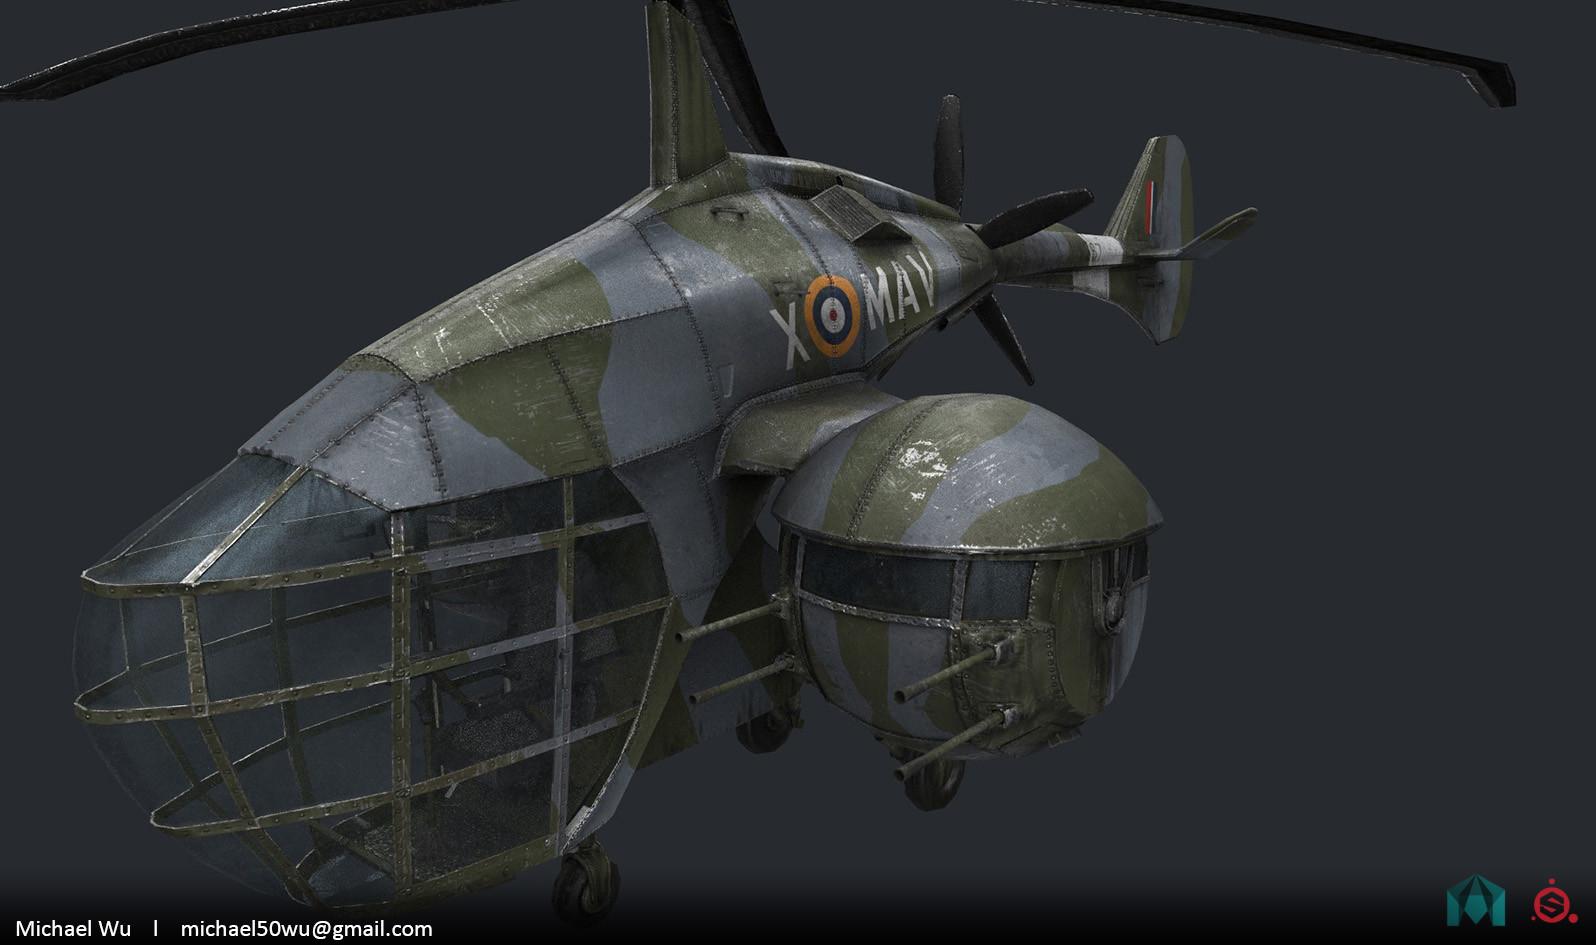 Military Autogyro